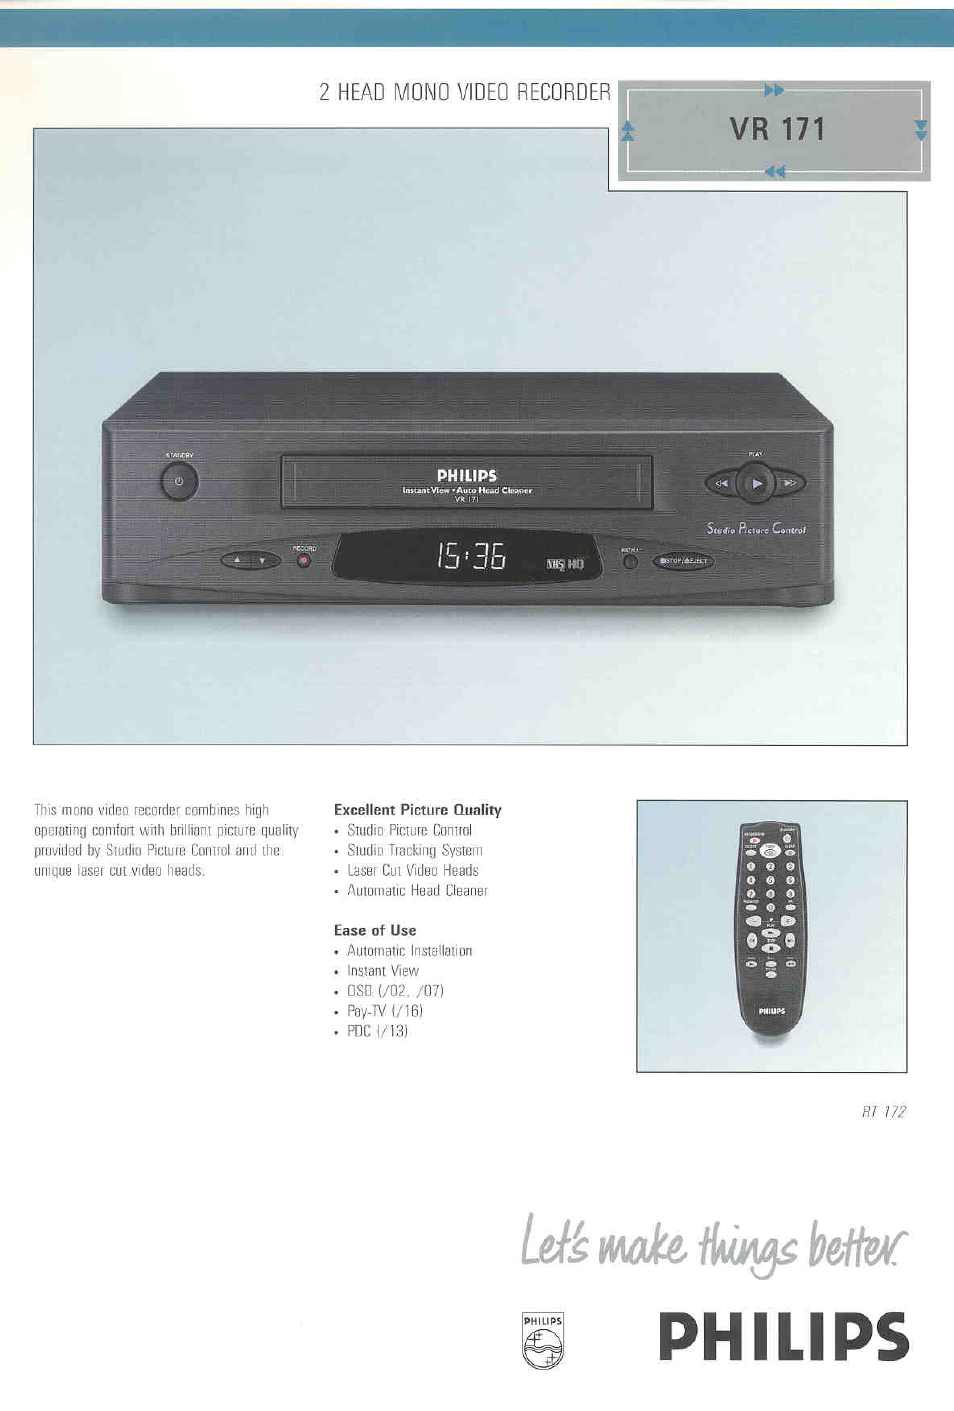 philips vr171 user manual